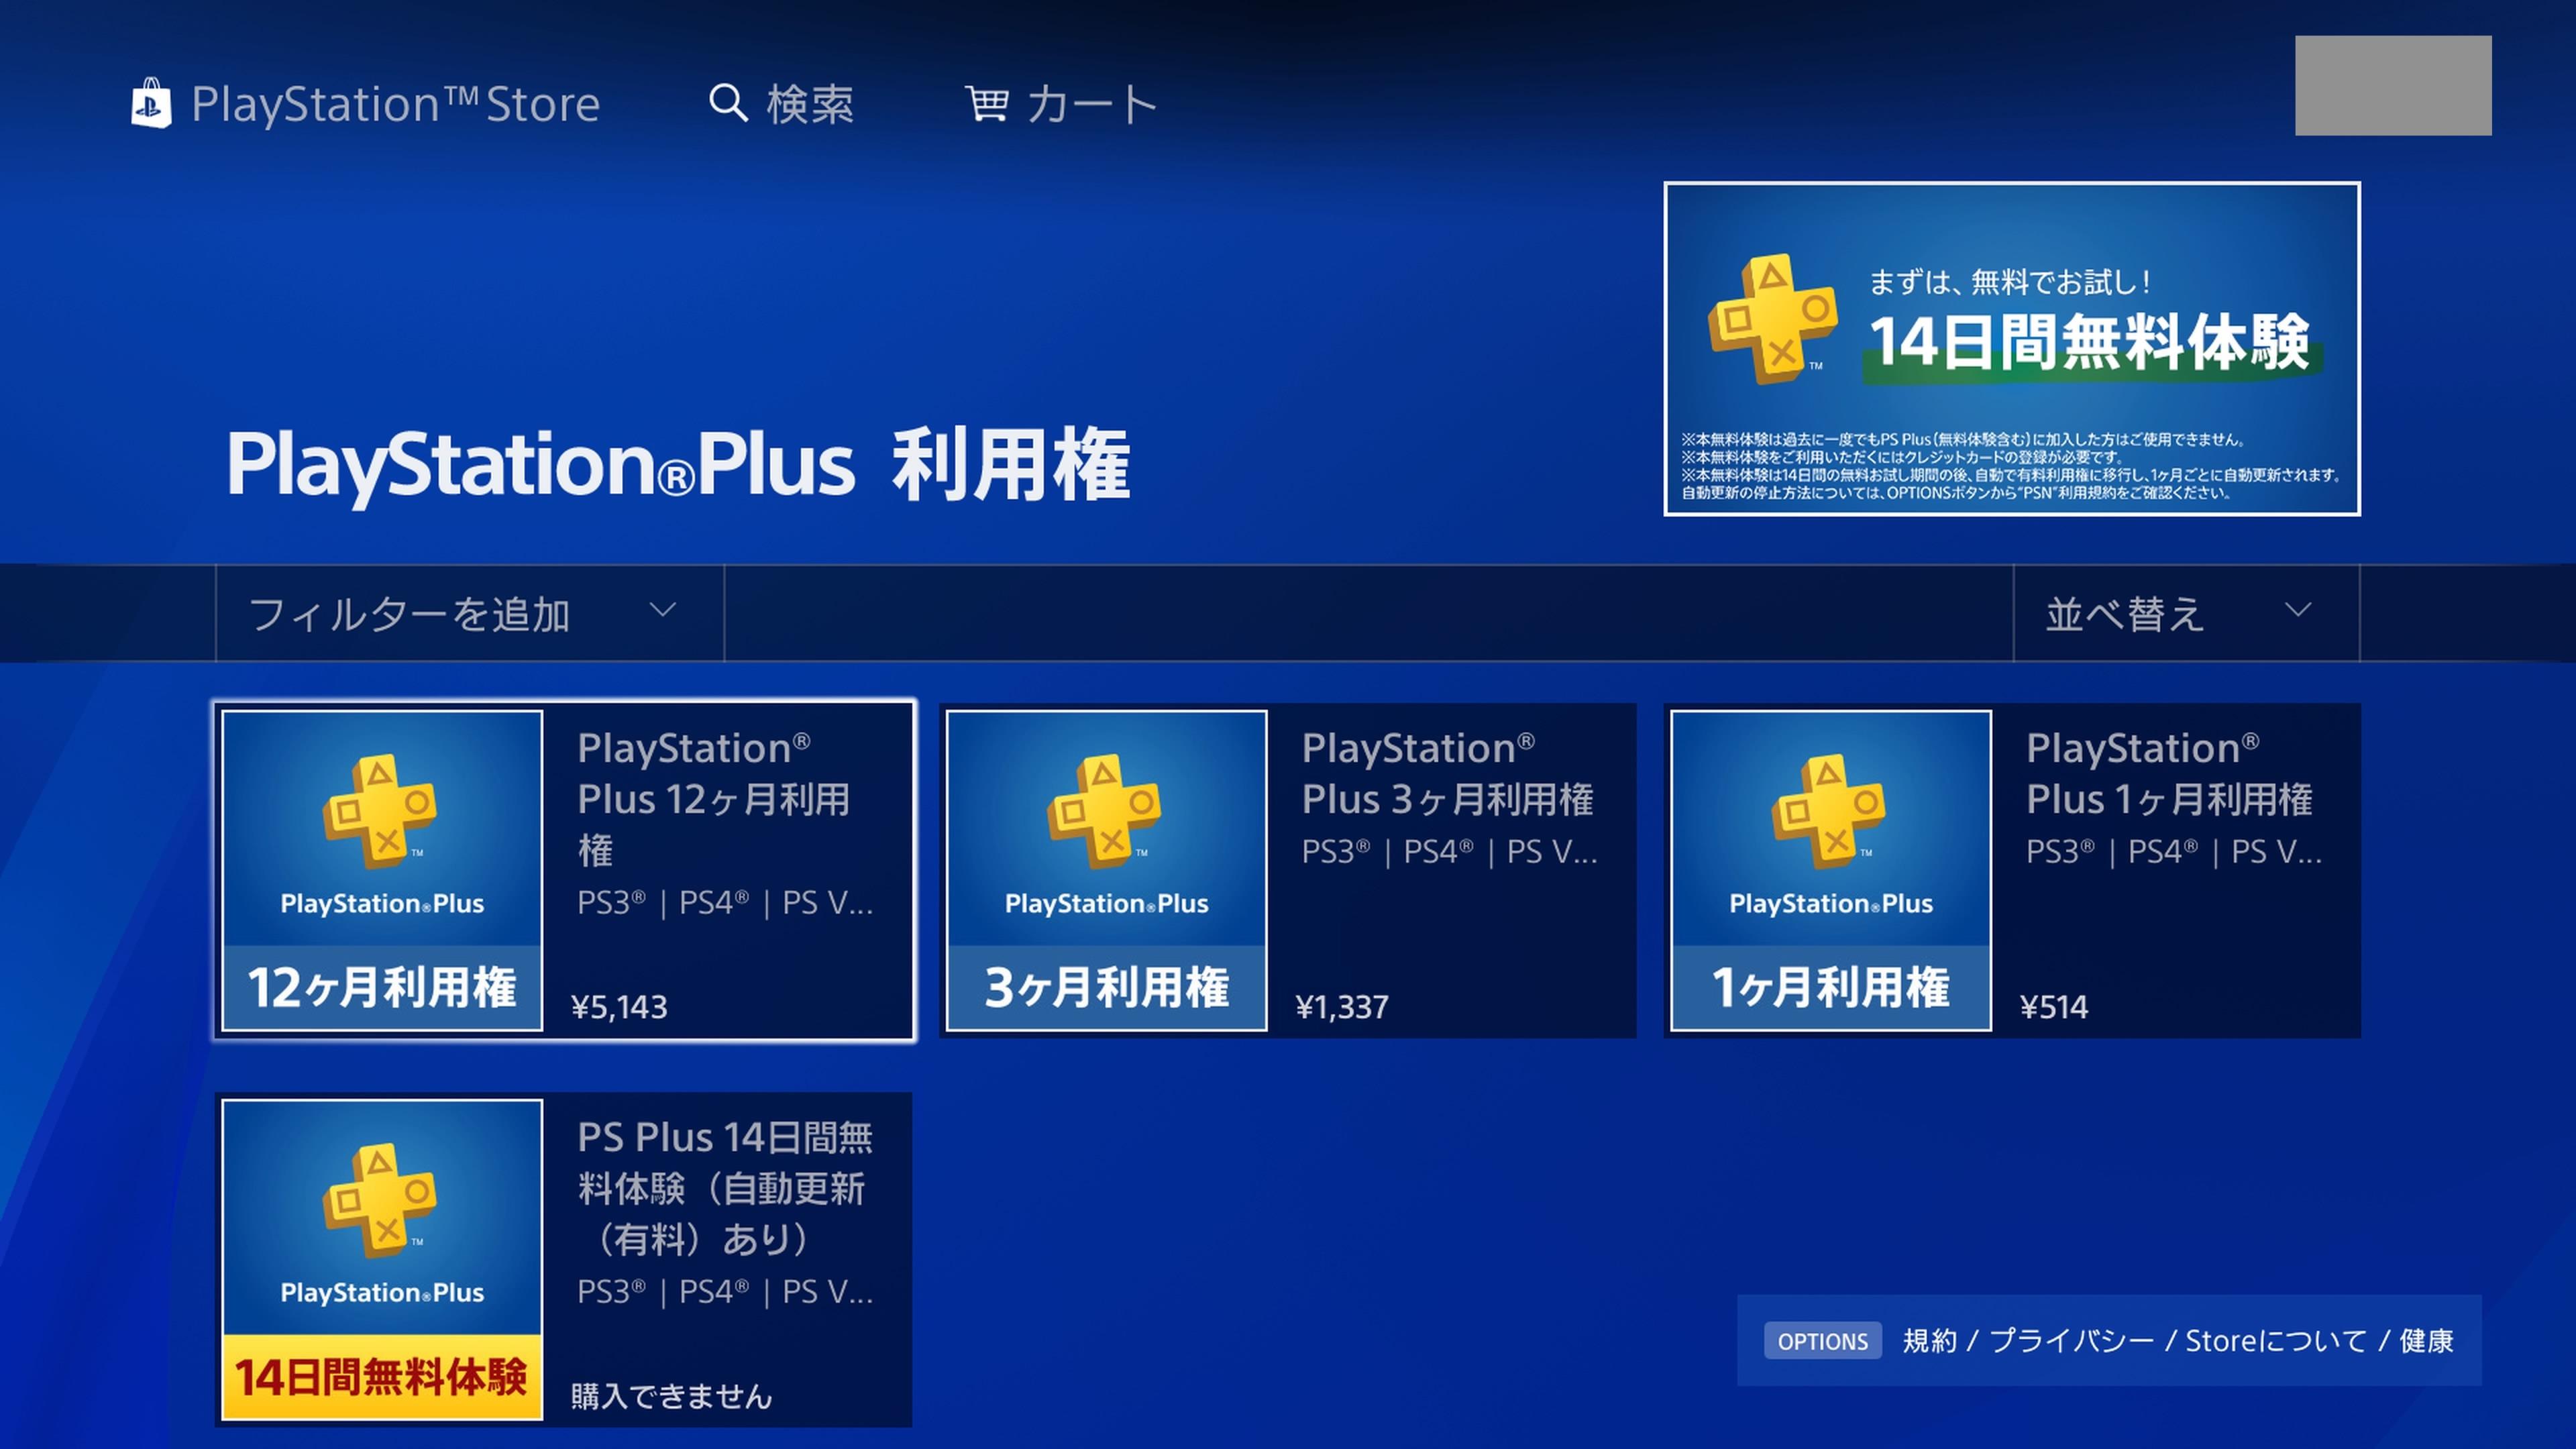 PS Plusが8/1(明日)から値上げへ